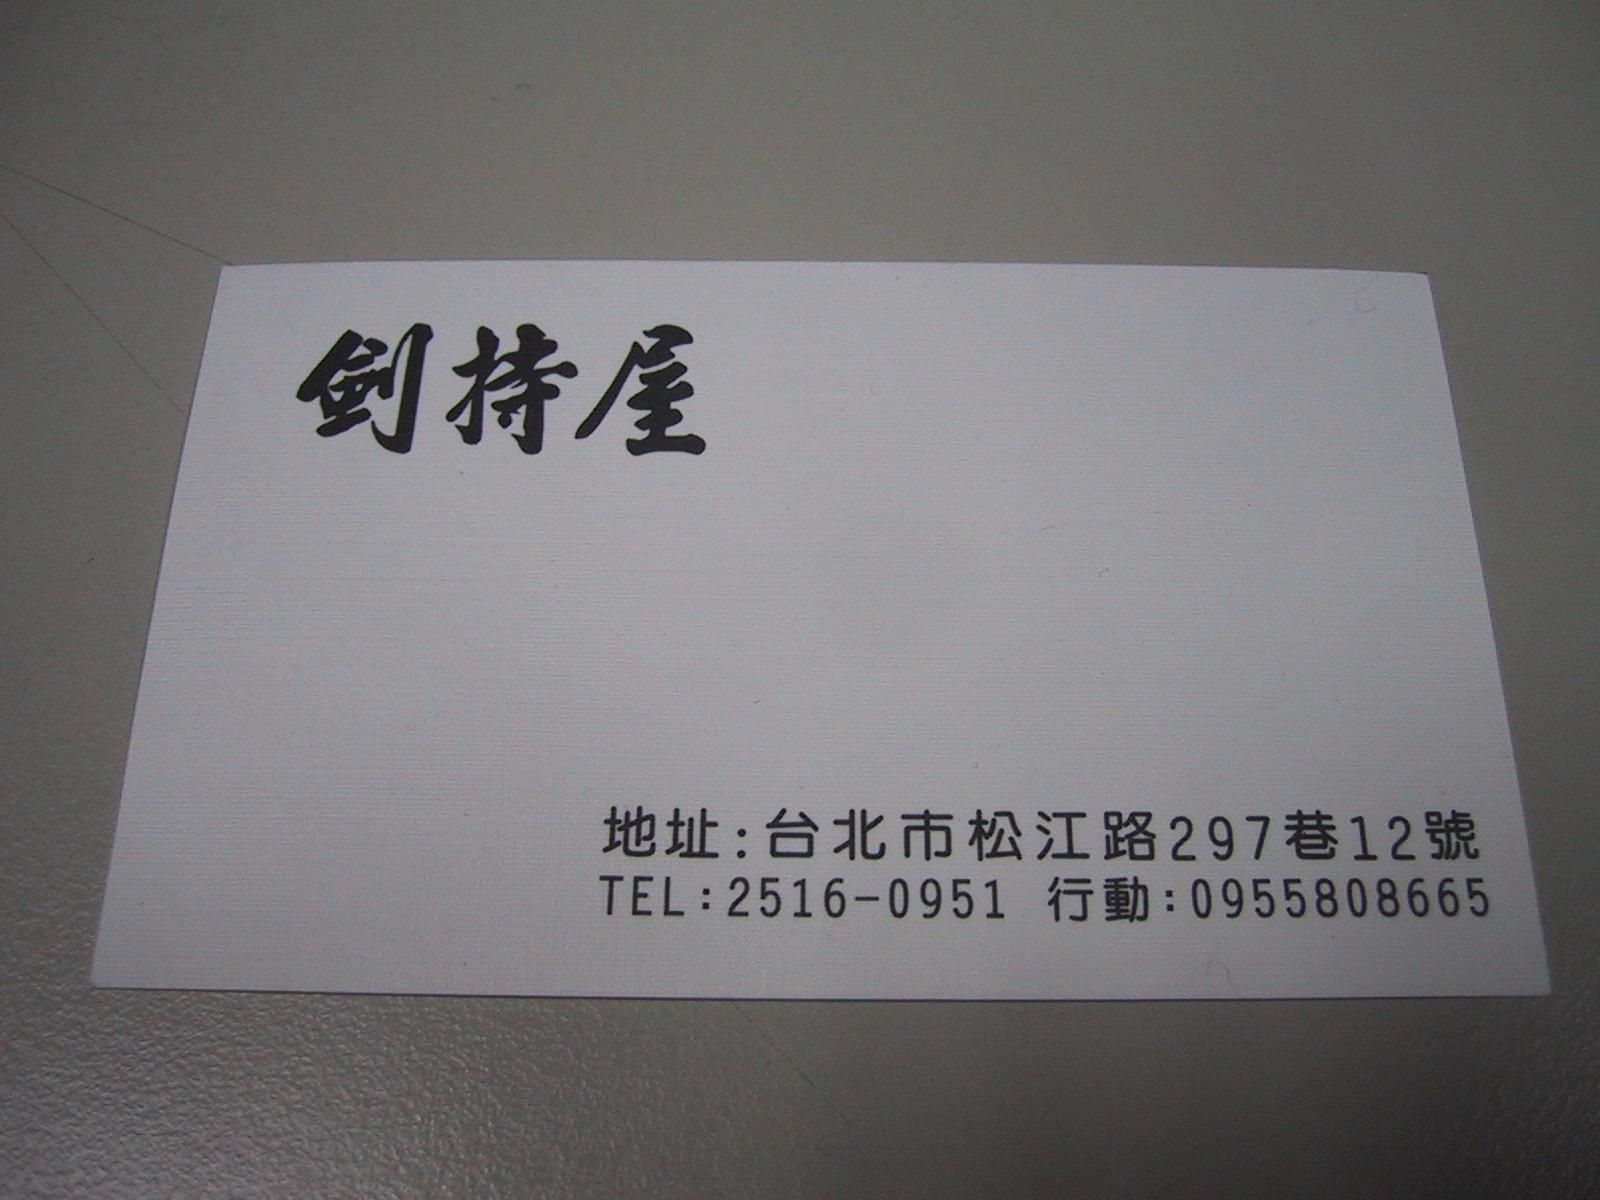 IMG_3538.JPG